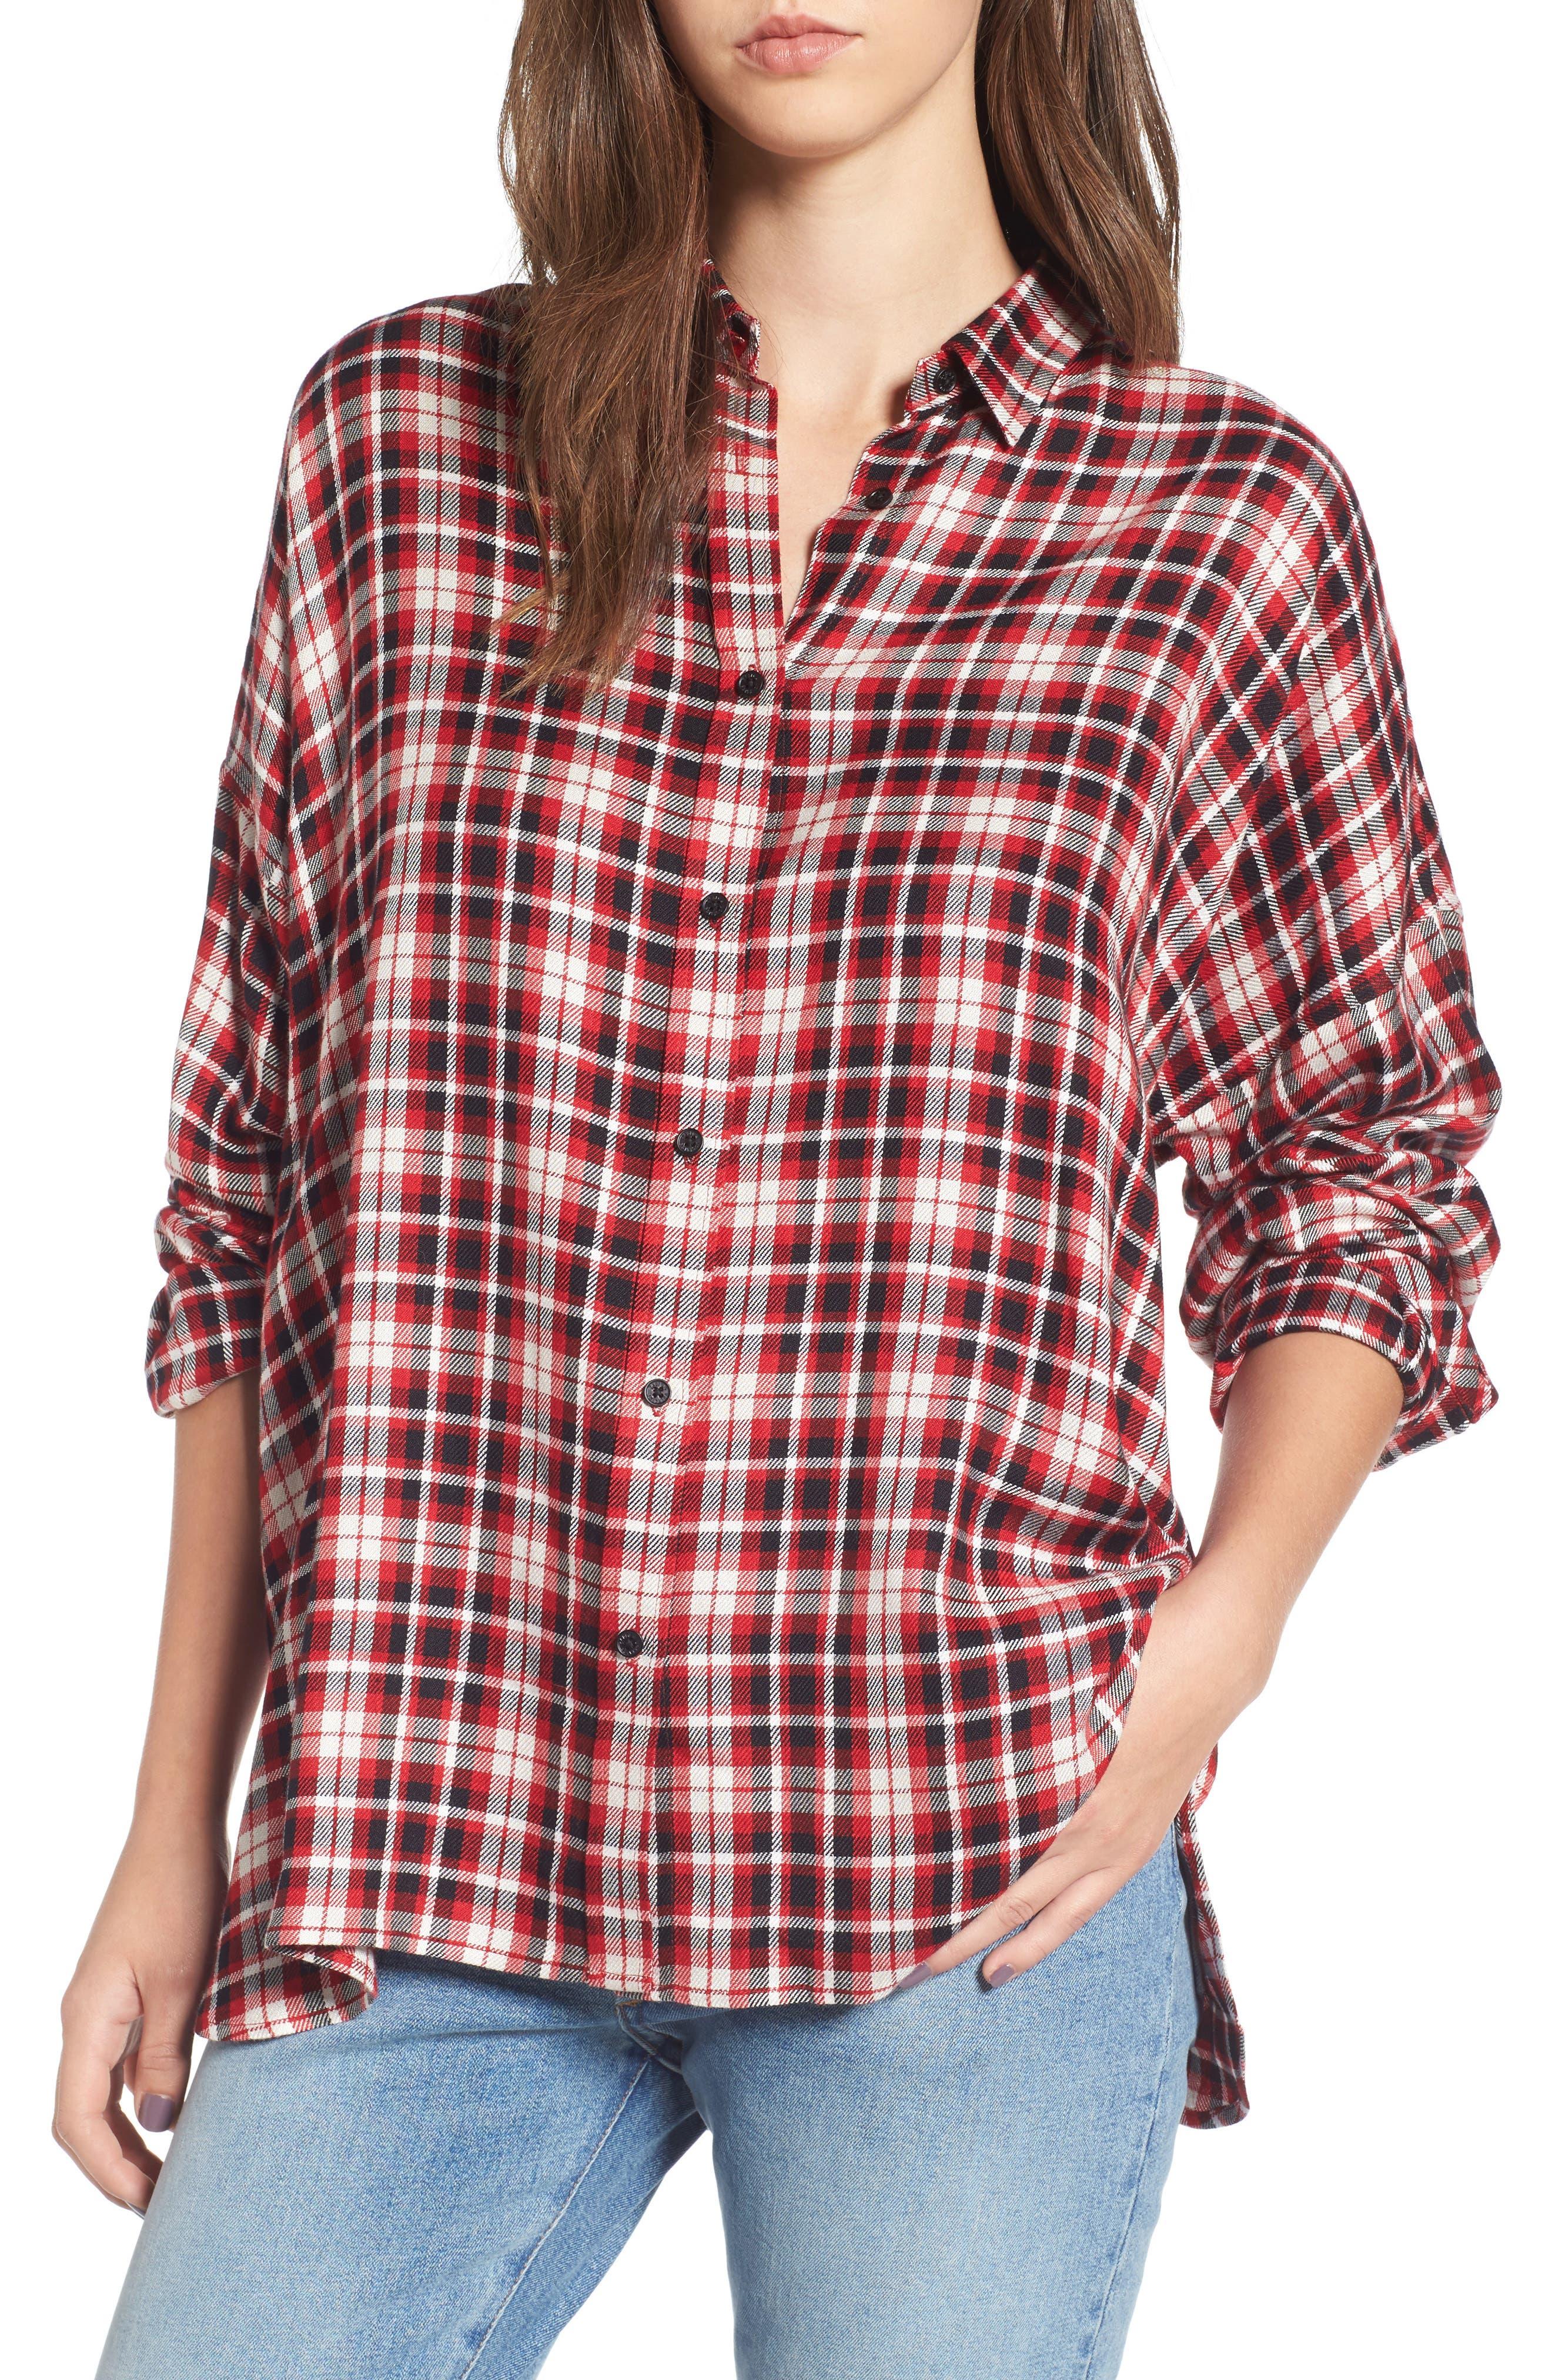 Tamara Car Plaid Shirt,                         Main,                         color, Rouge